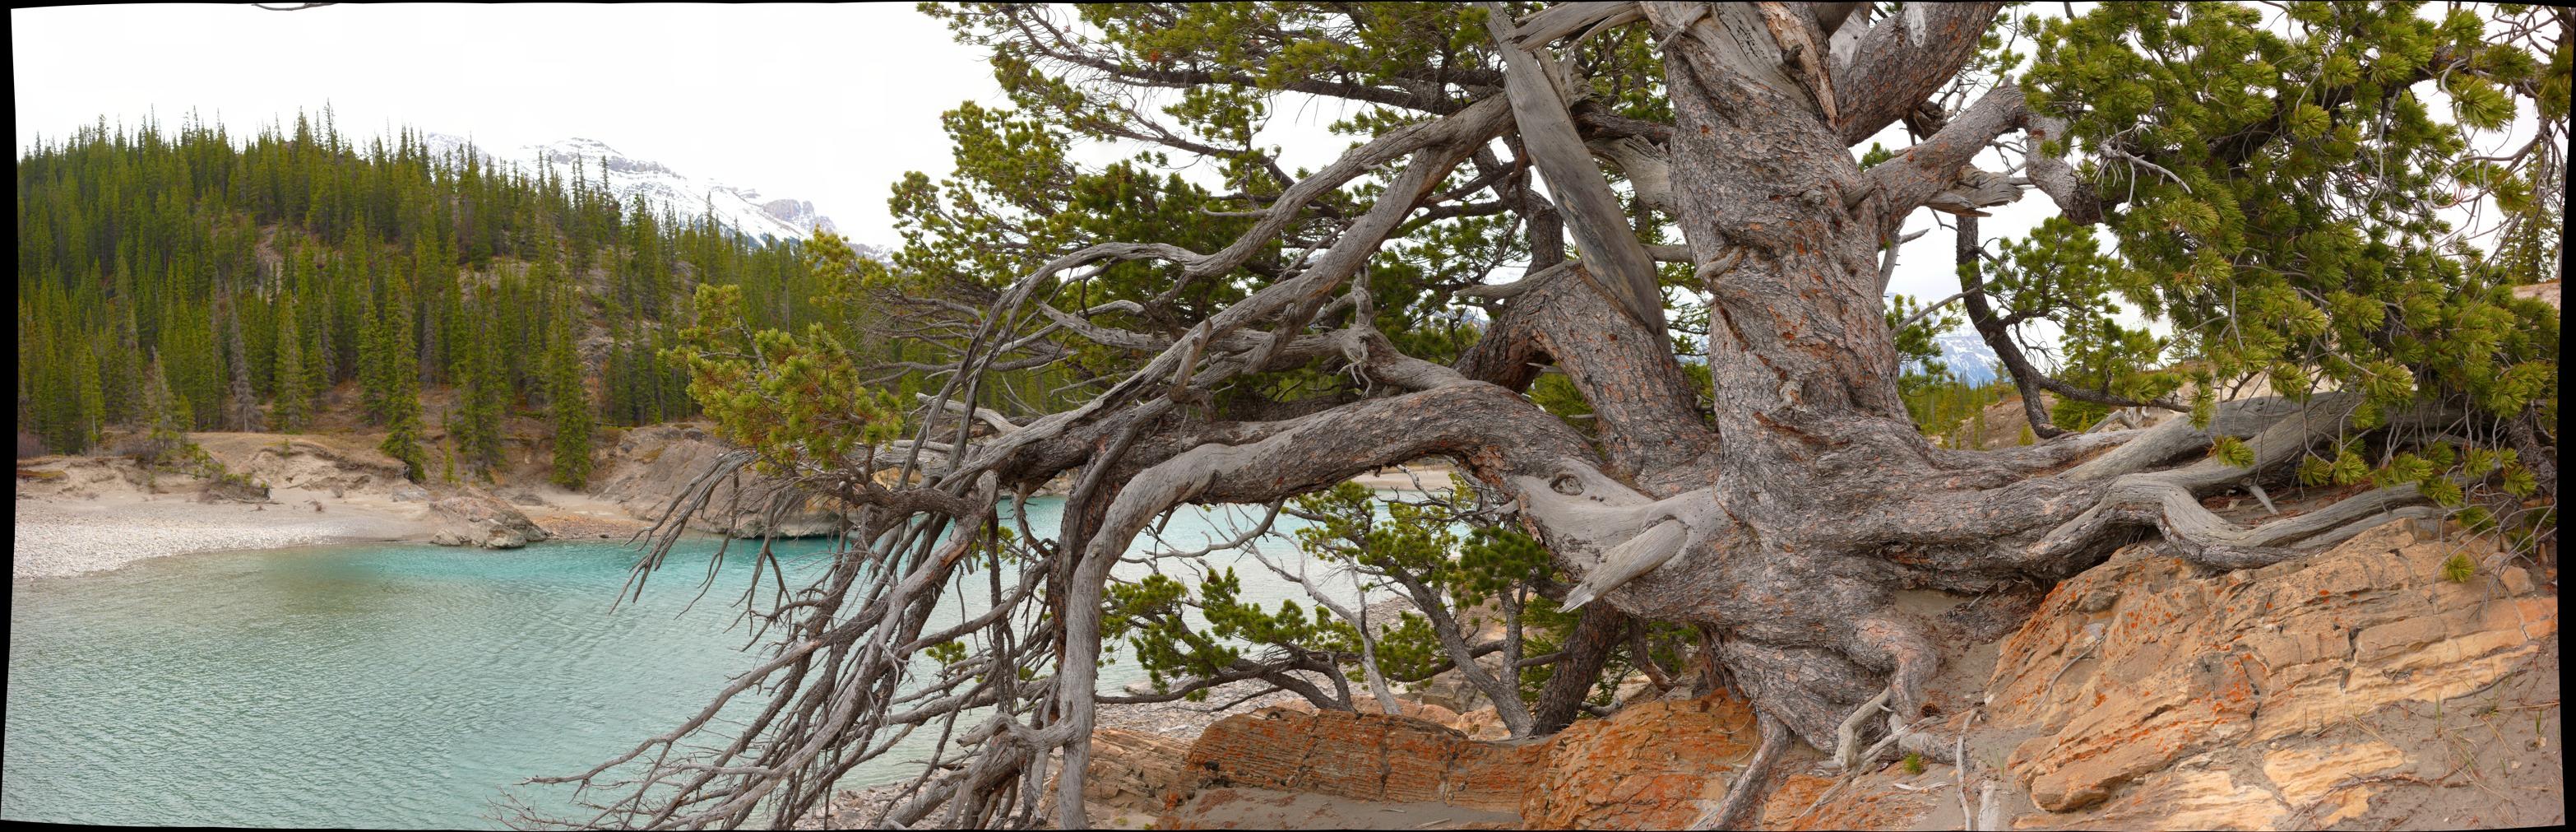 Ancient Pine, Whirlpool point 10.jpg